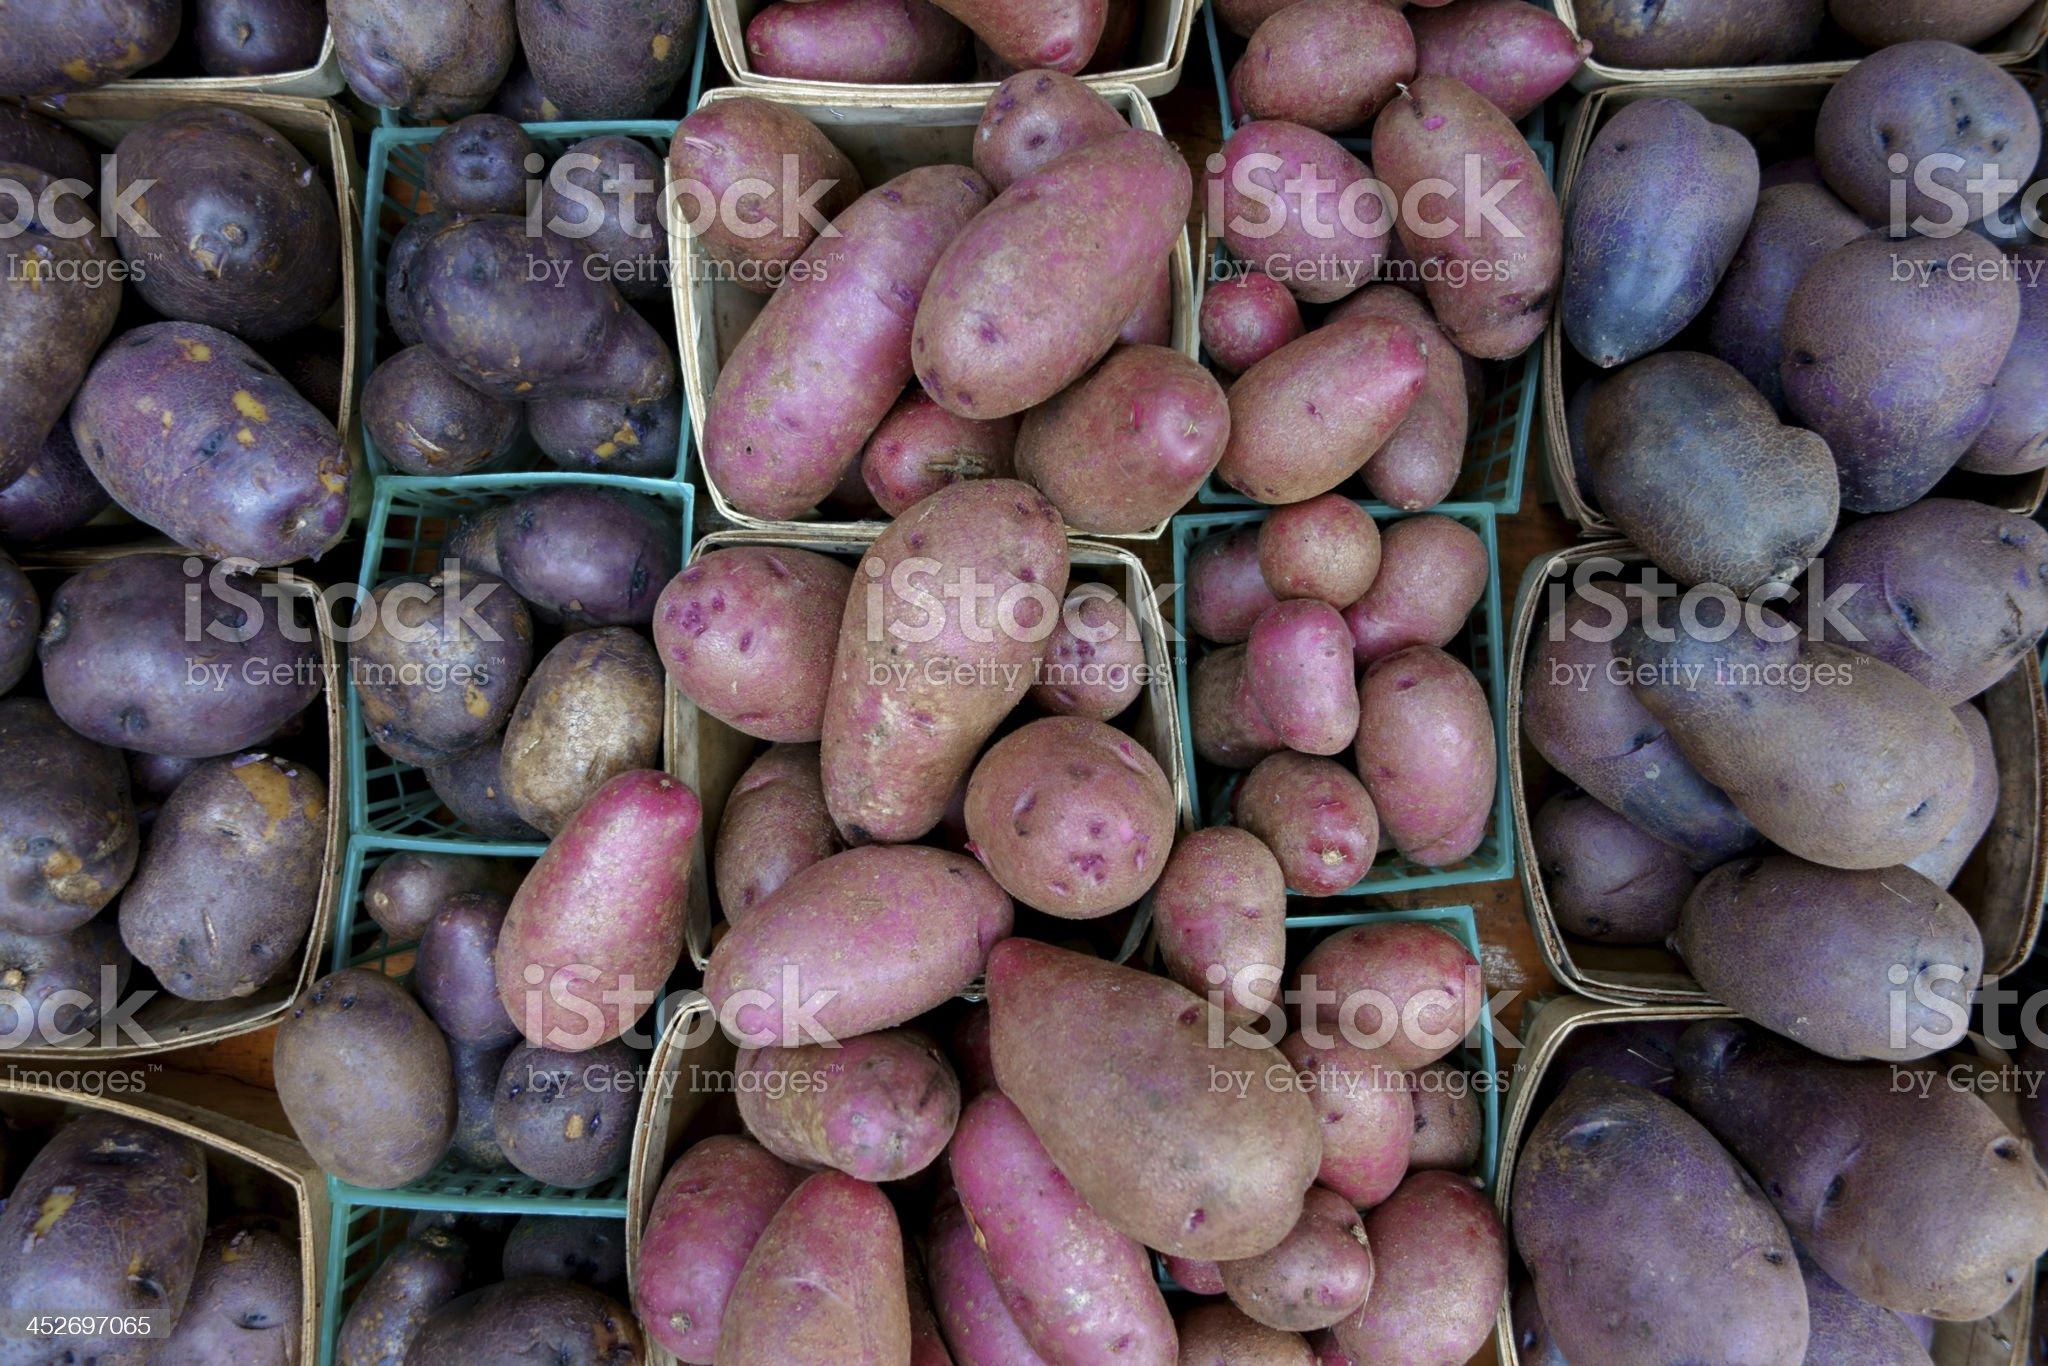 Potatos at Farmers Market royalty-free stock photo